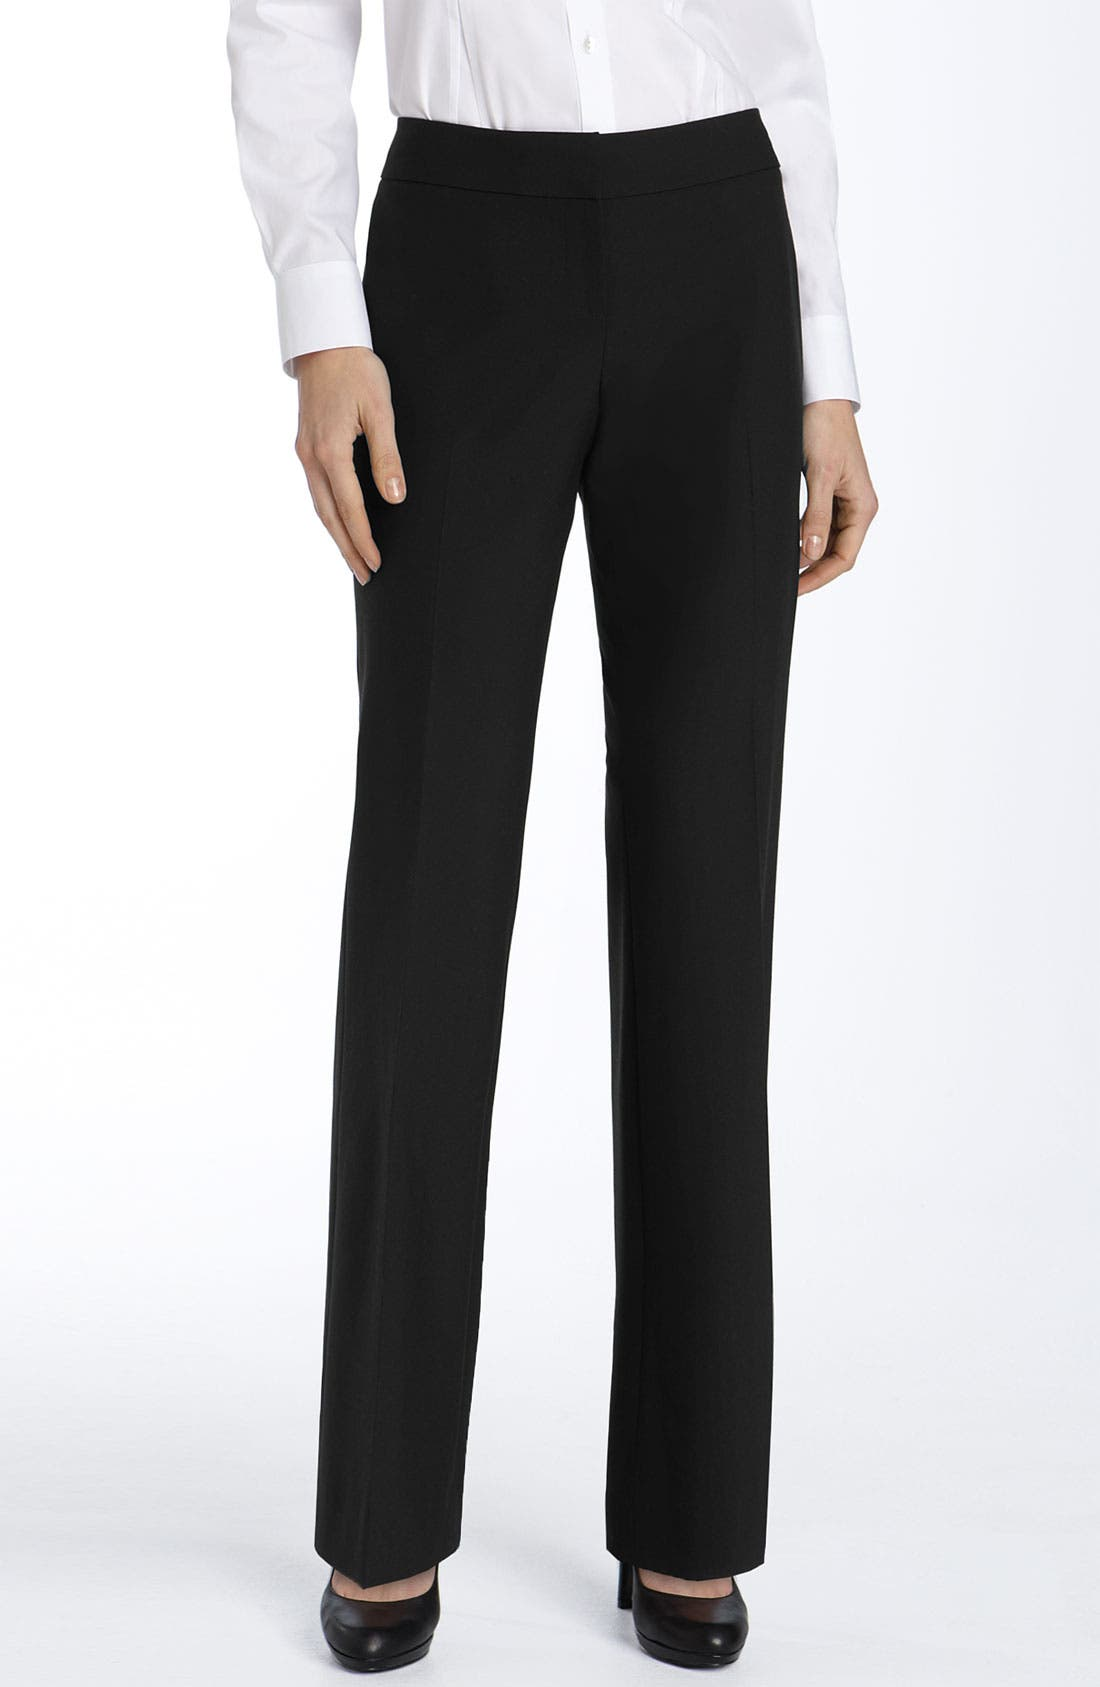 Main Image - Halogen® 'Taylor' Straight Leg Pants (Petite)